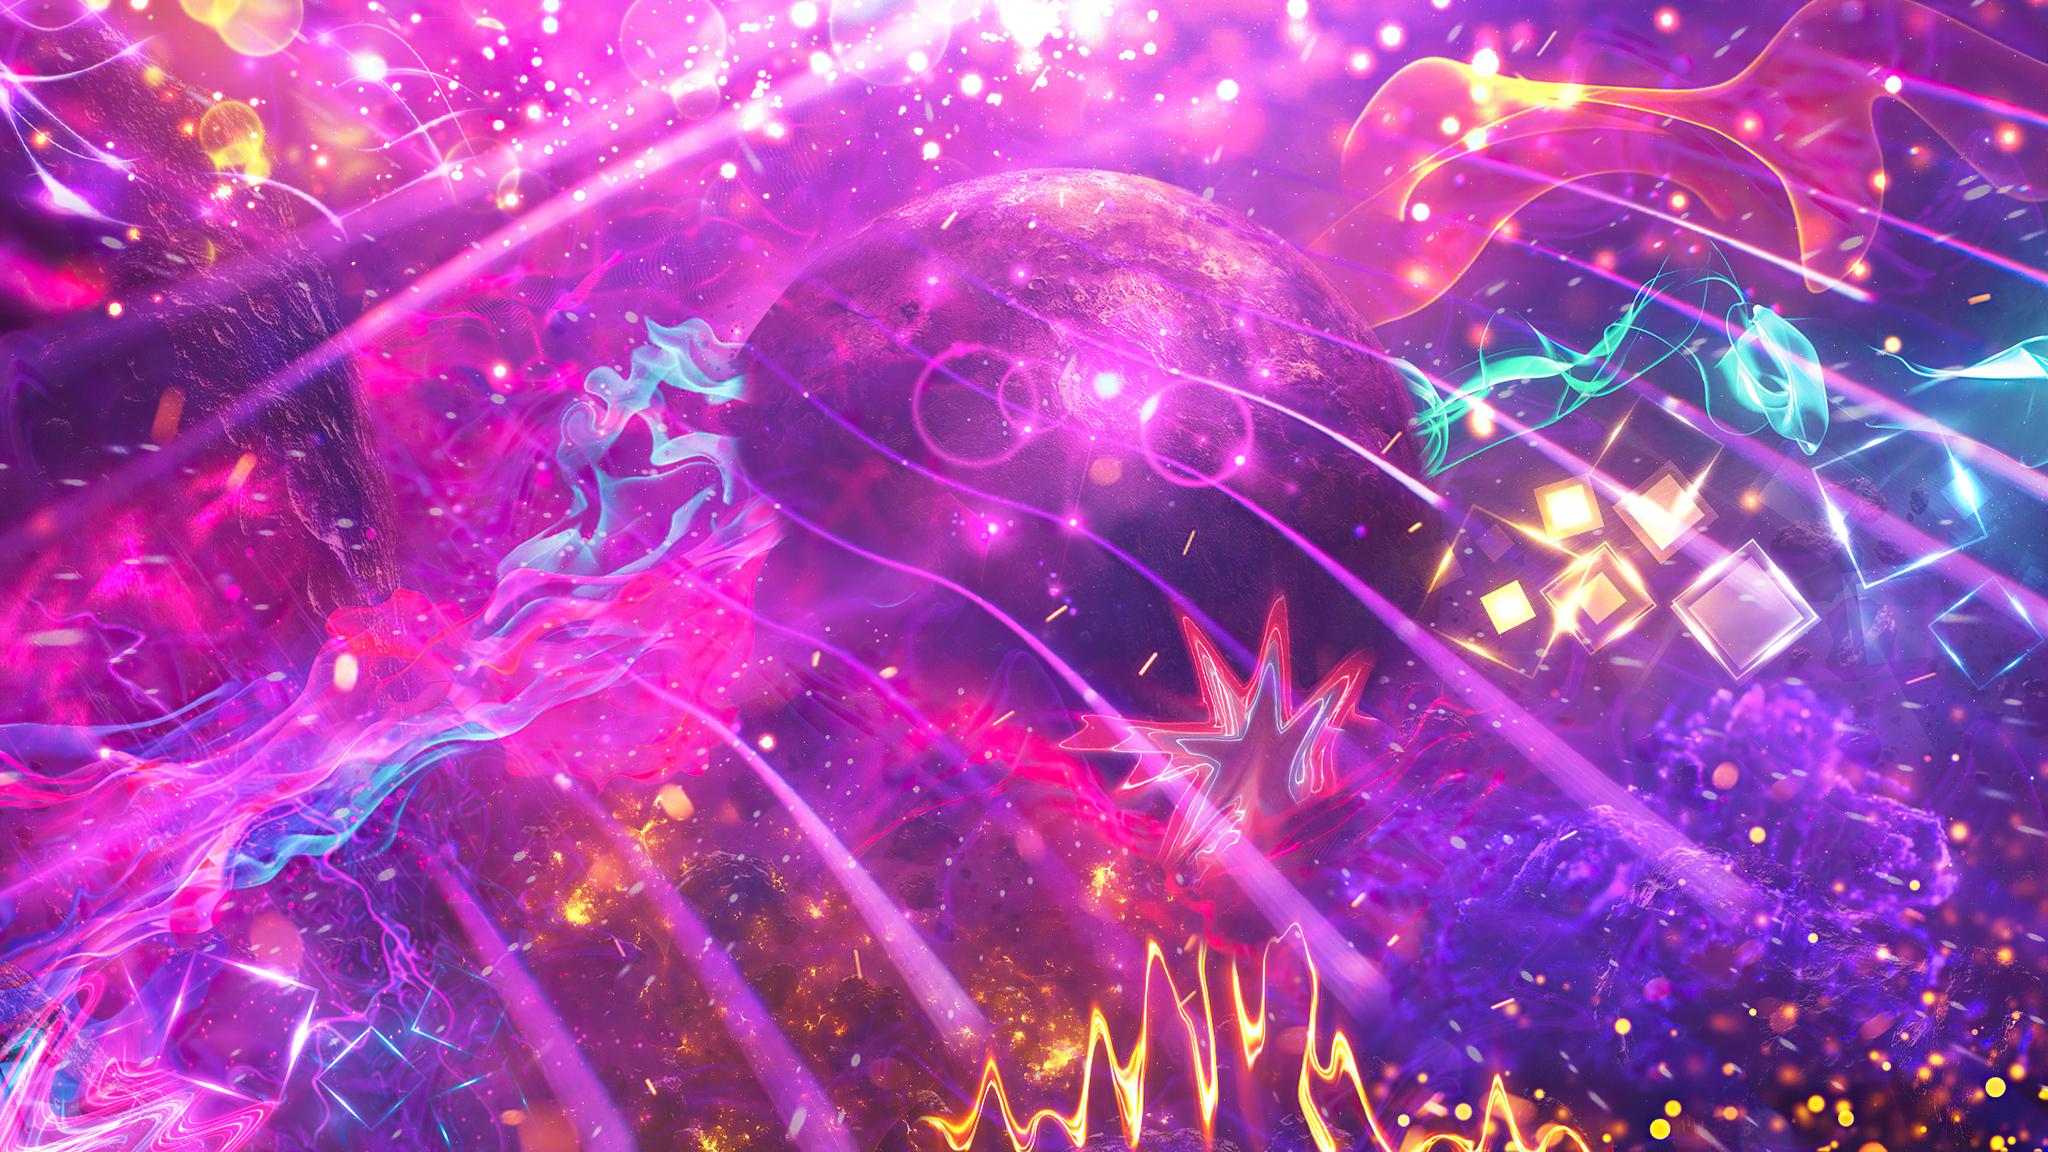 2048x1152 Nebula Neon Colors Fractal ...